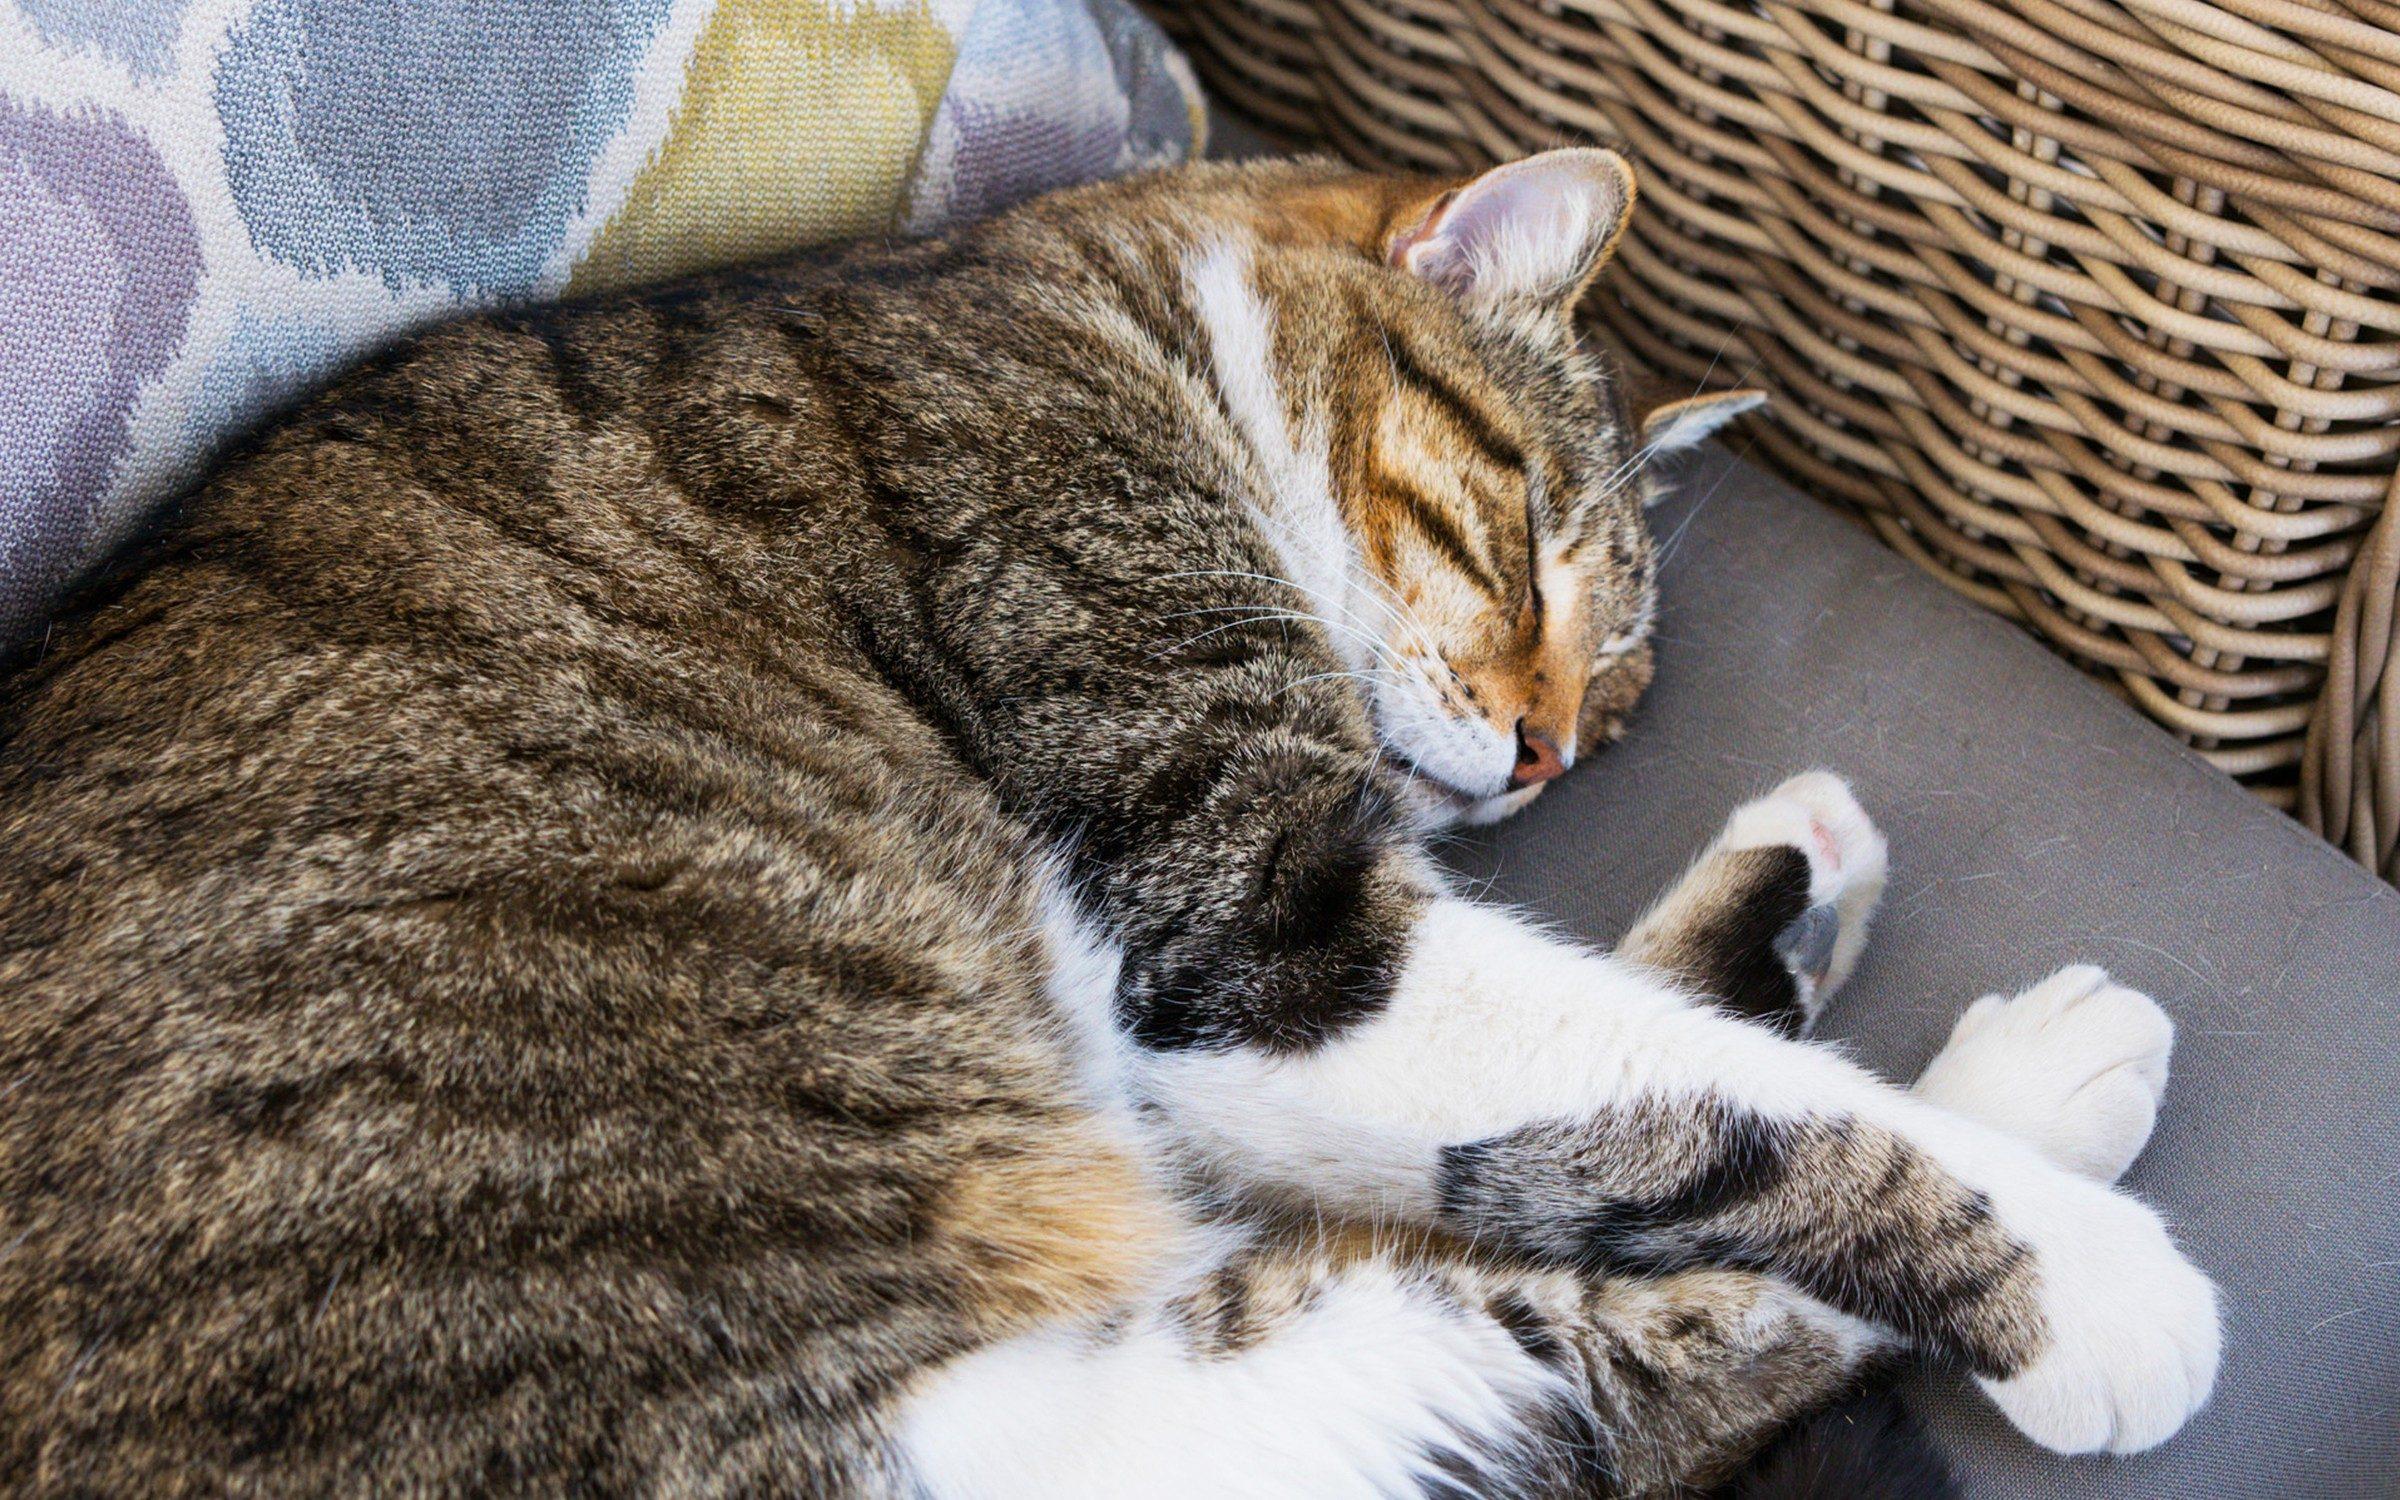 Ozzie Asleep on Patio Furniture